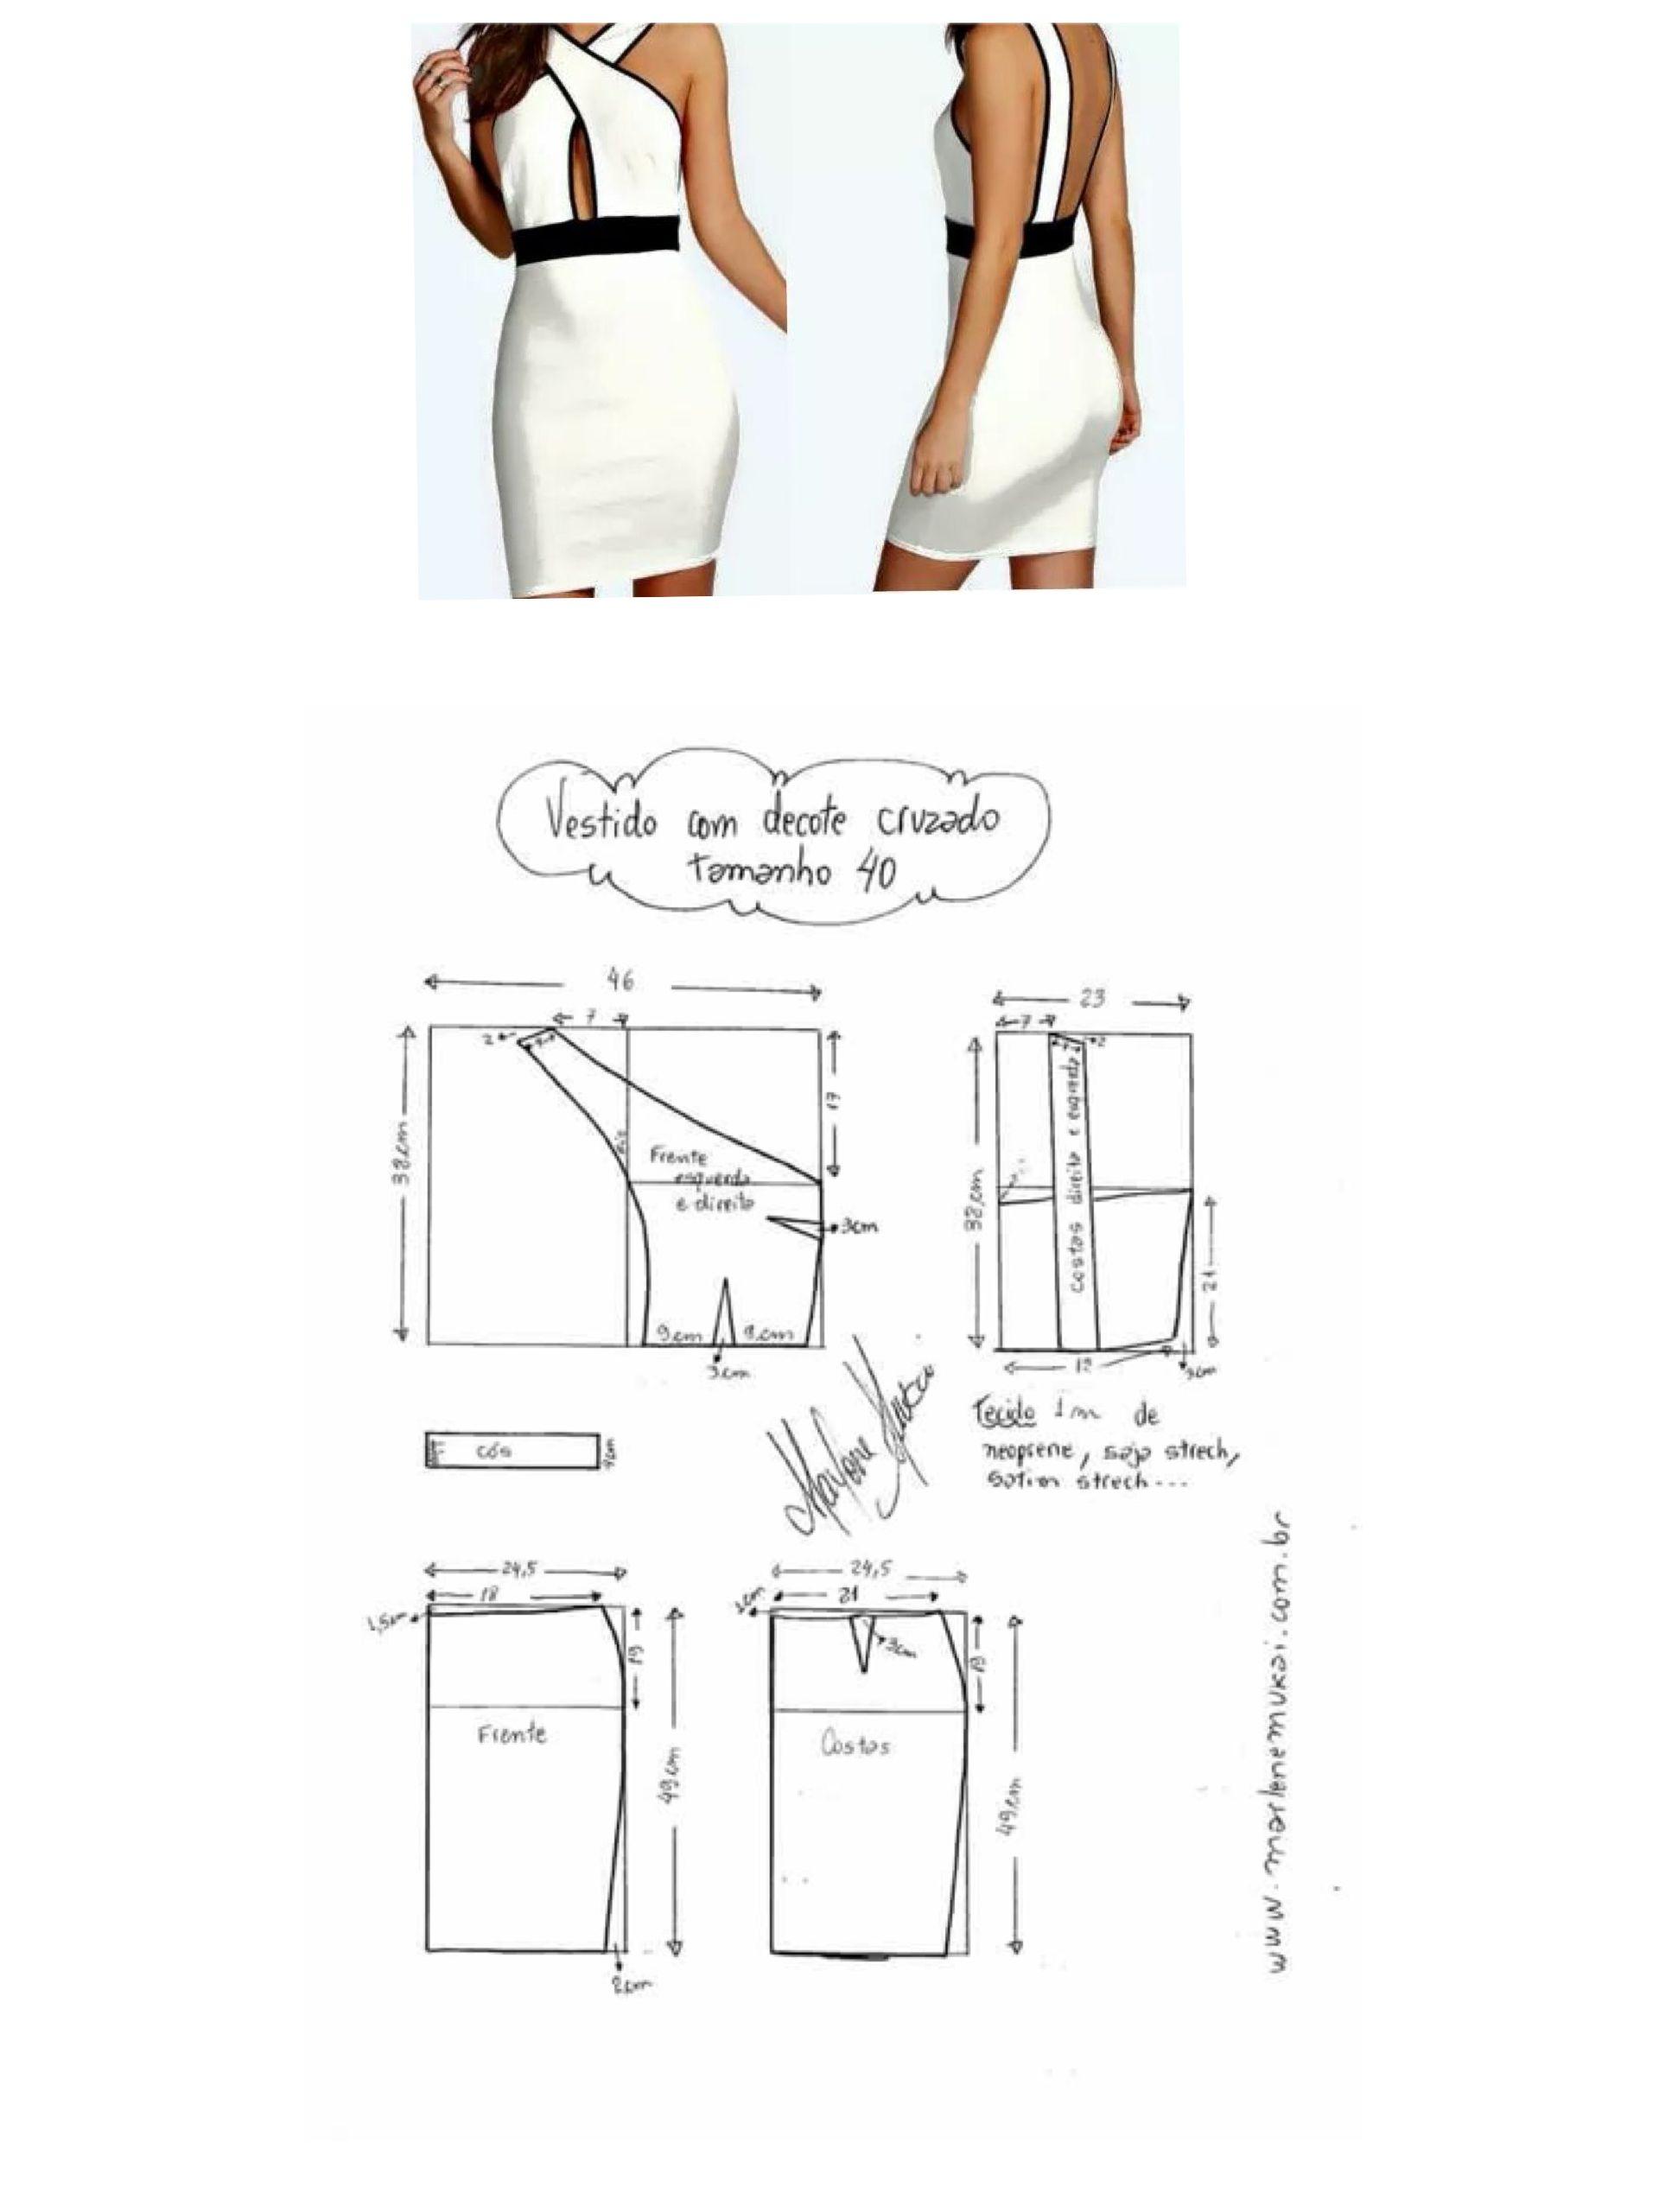 Pin de Winnie Ng en dress | Pinterest | Patrones, Molde y Costura